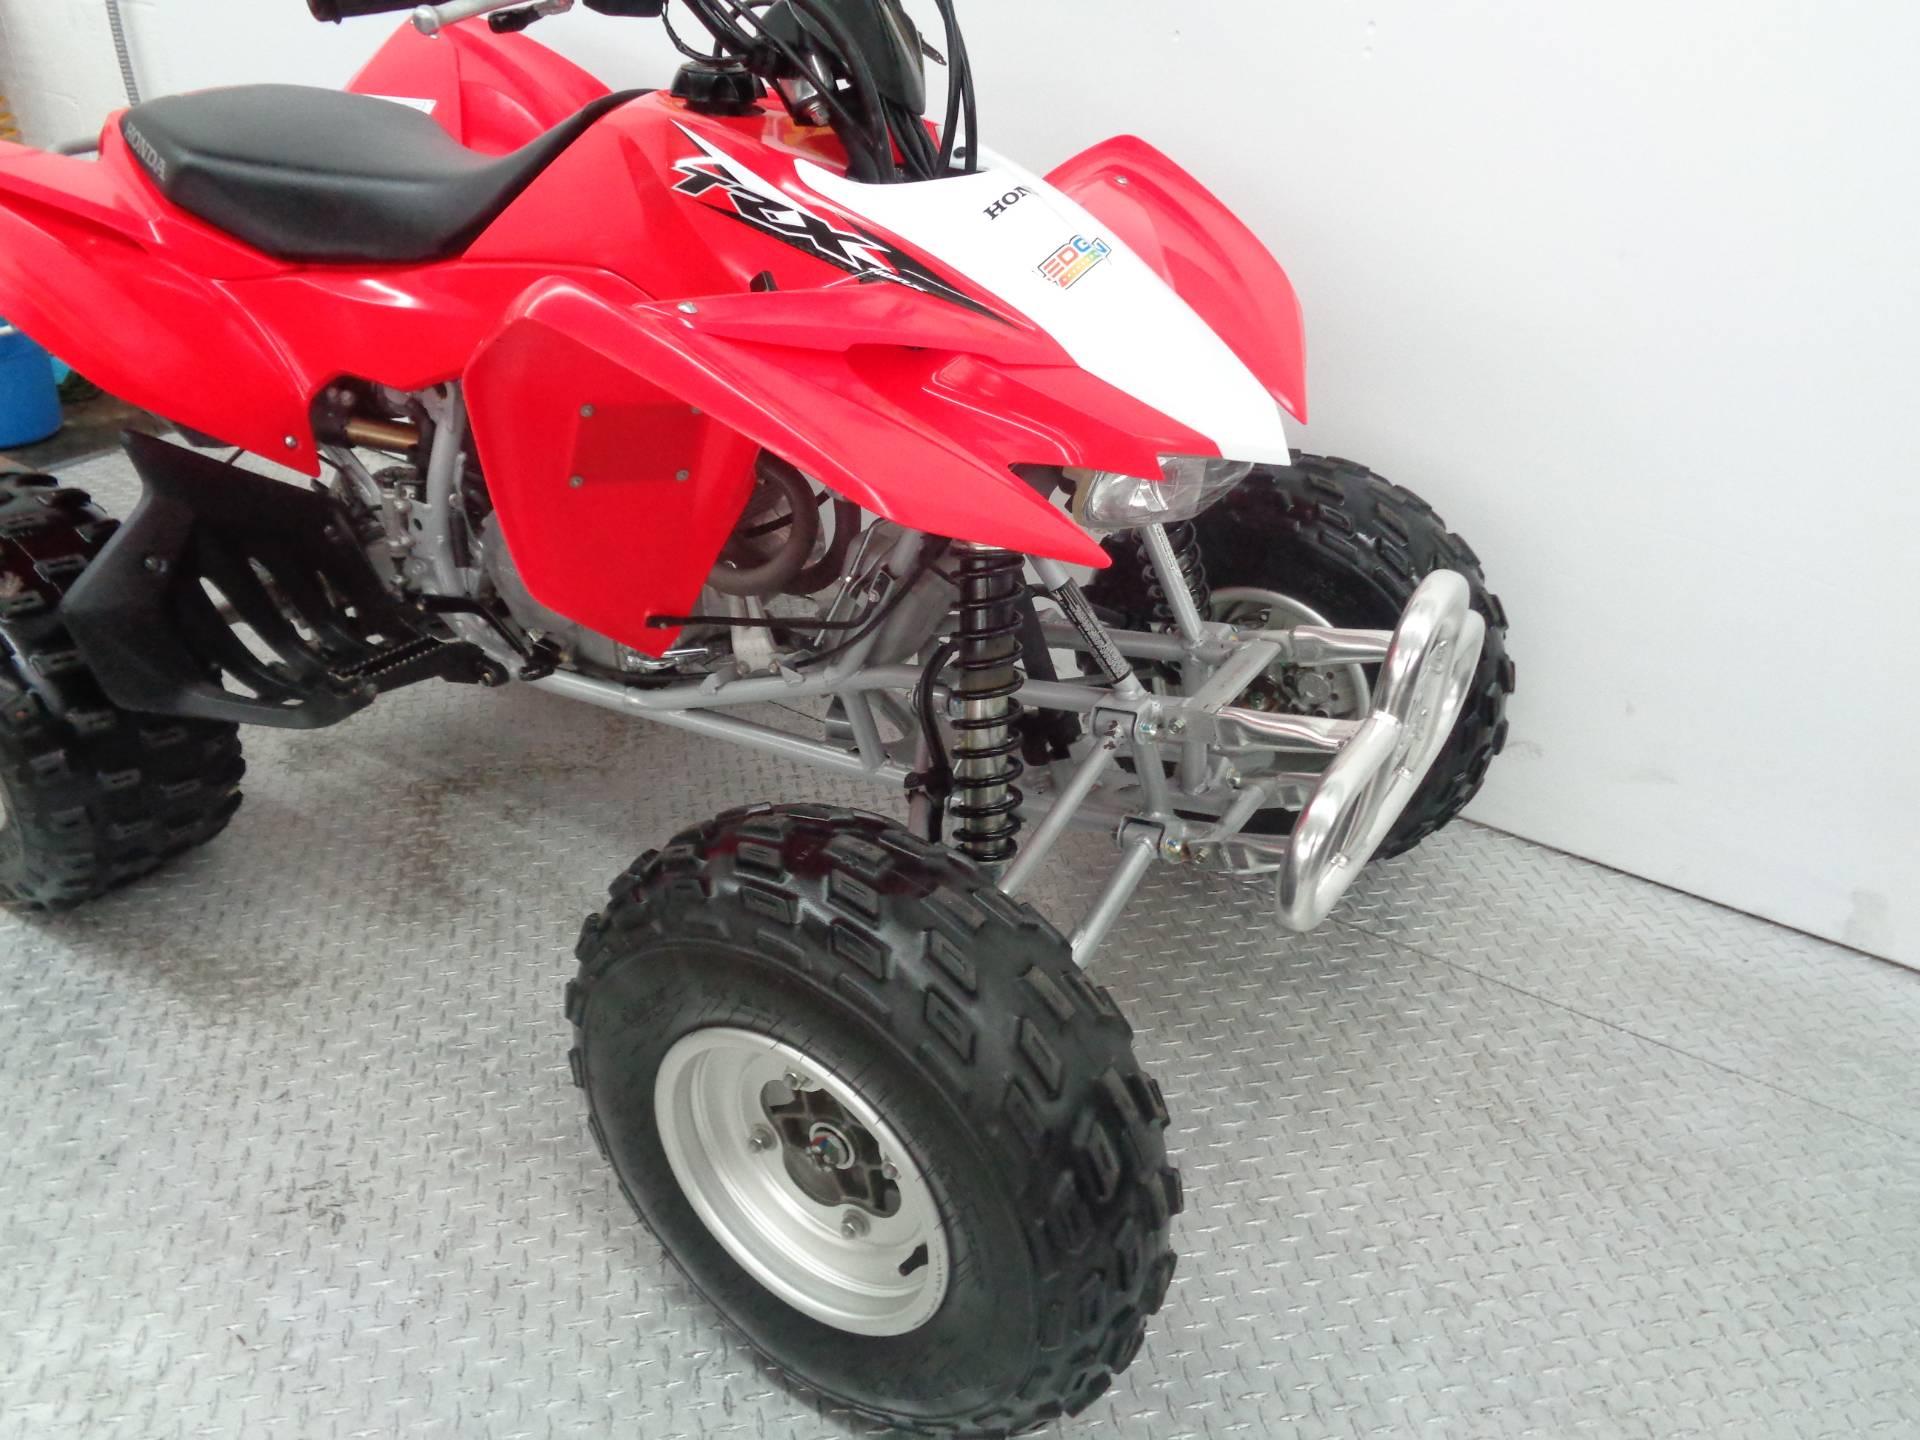 Used 2014 Honda TRX®400X ATVs in Tulsa, OK | Stock Number: 502581